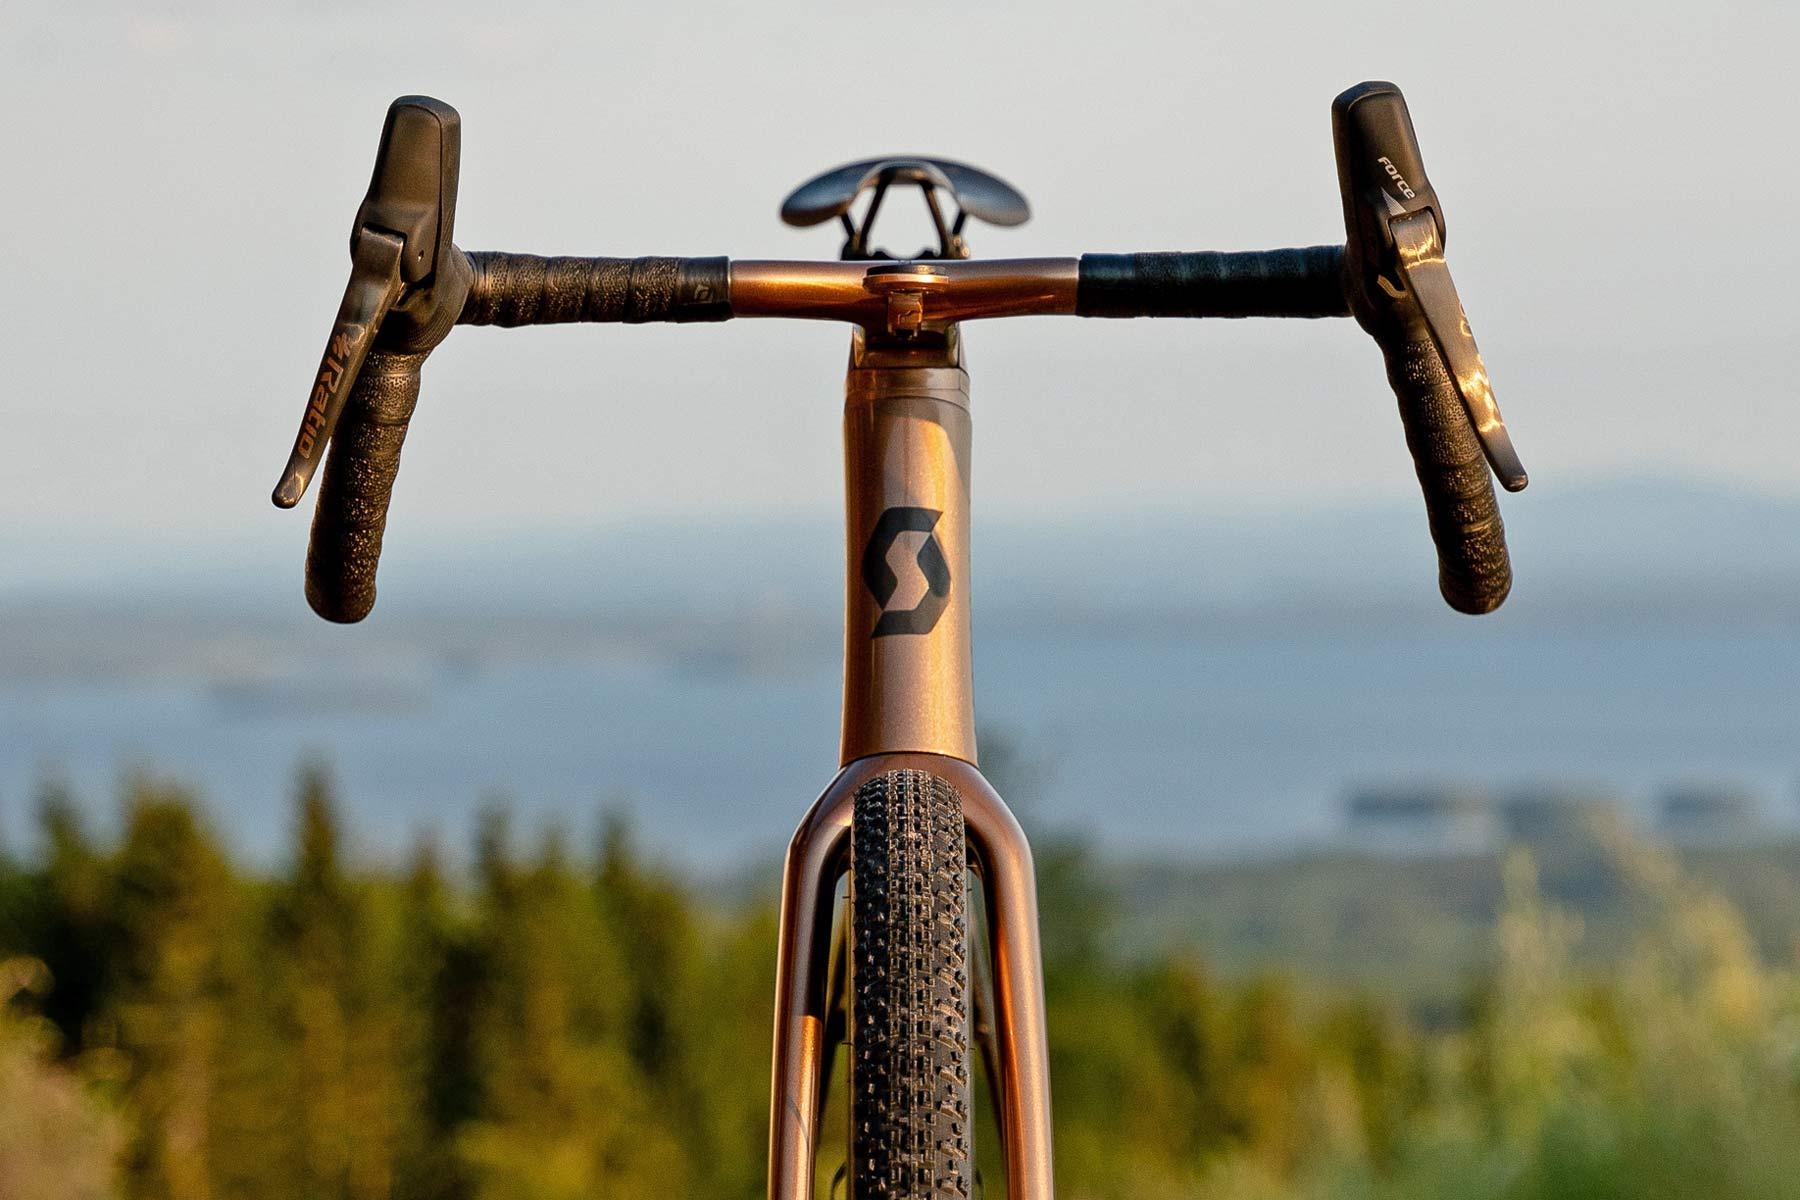 custom Scott Addict Gravel Tuned Dangerholm edition lightweight carbon prototype gravel bike project,fully integrated